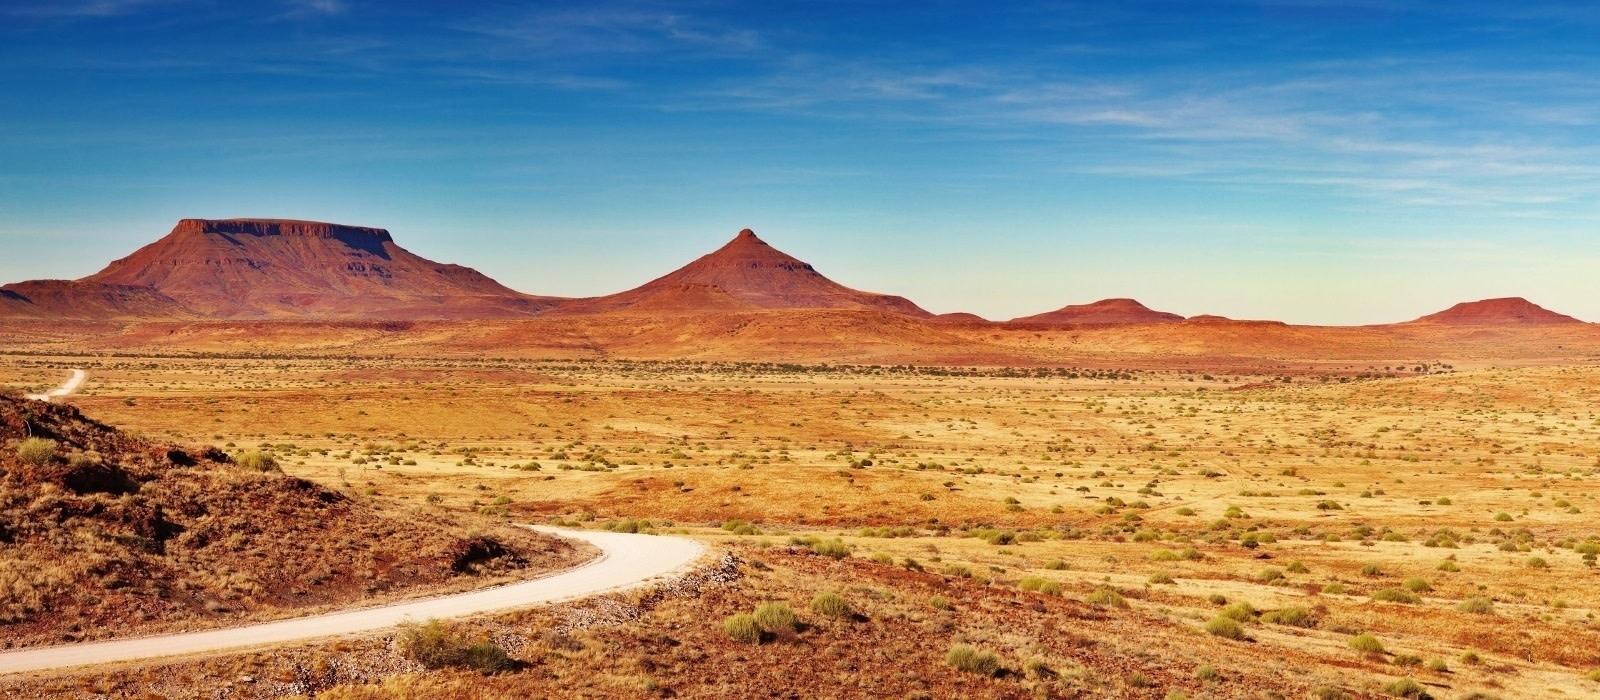 Reiseziel Damaraland (Twyfelfontein) Namibia